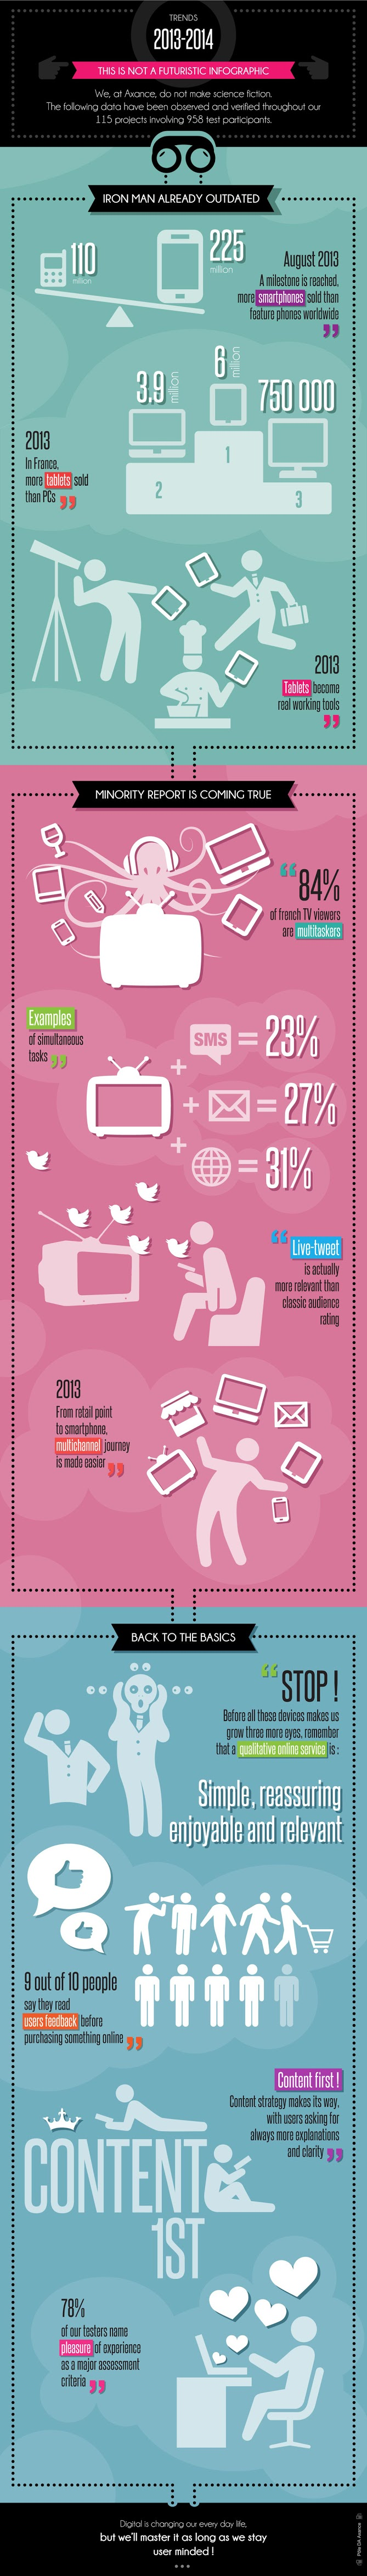 2013 - 2014 Digital Trends #infographic